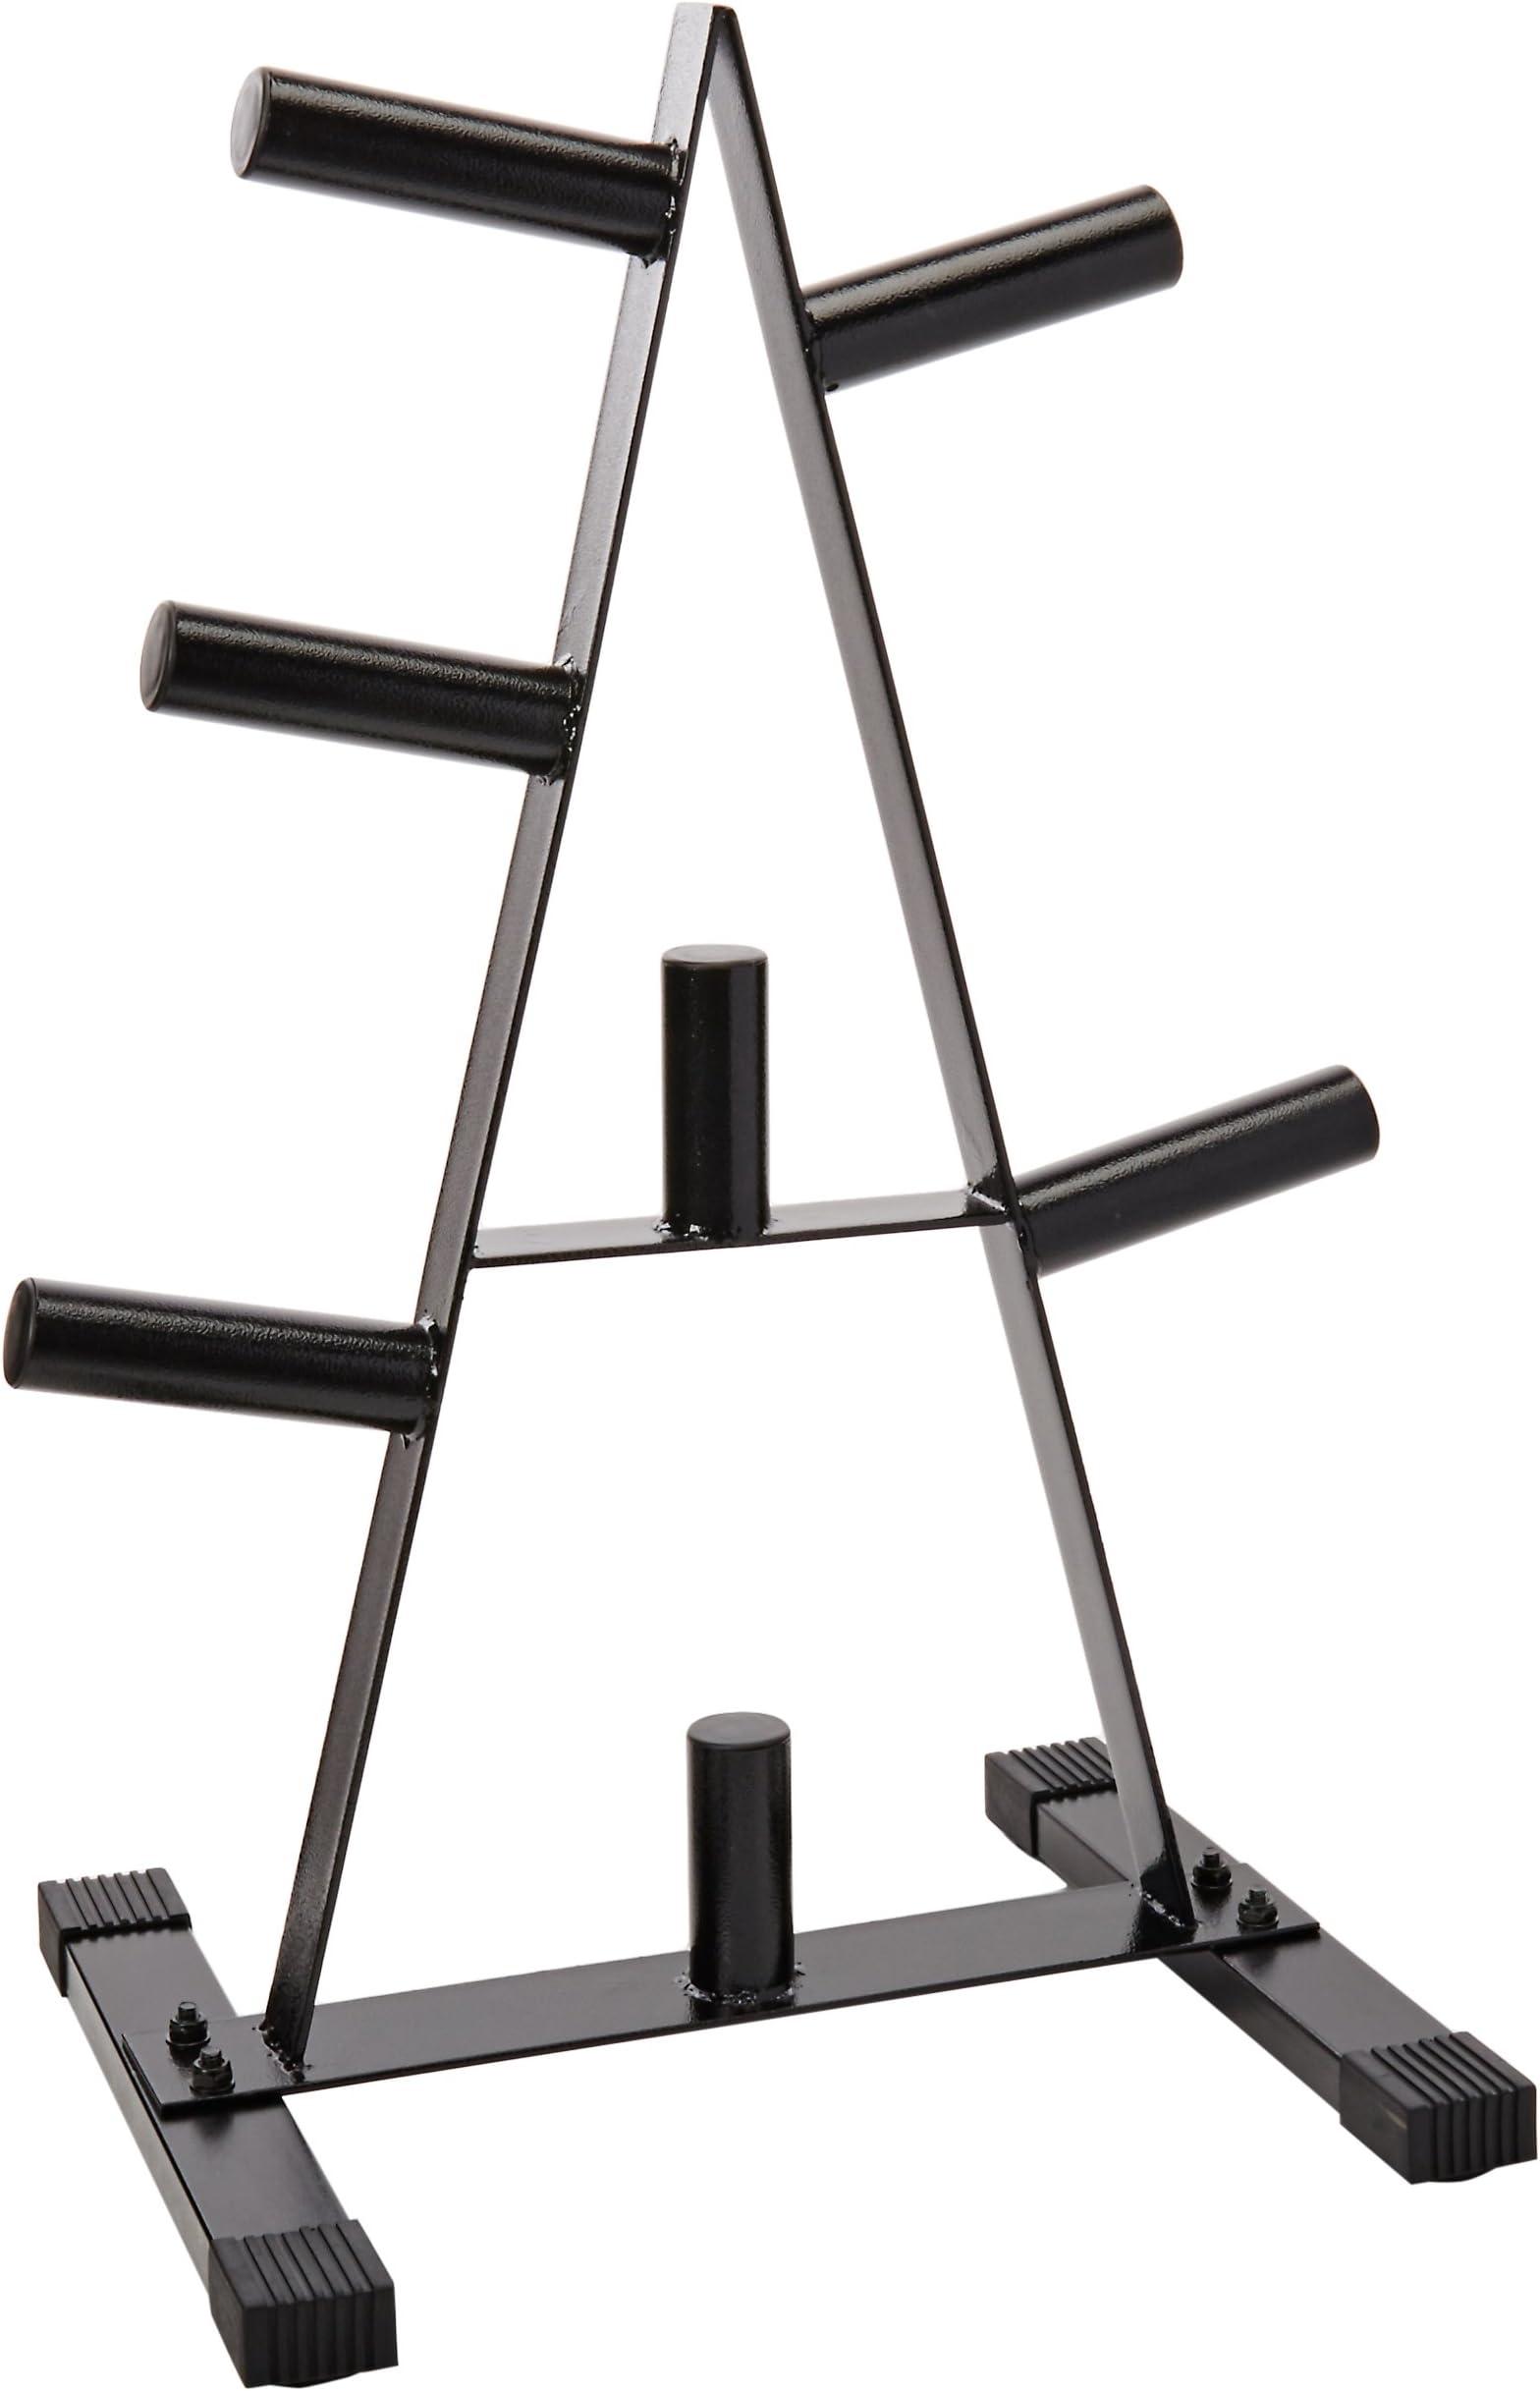 CAP Barbell Olympic 2-Inch Plate Rack  sc 1 st  Amazon.com & Weight Racks | Amazon.com